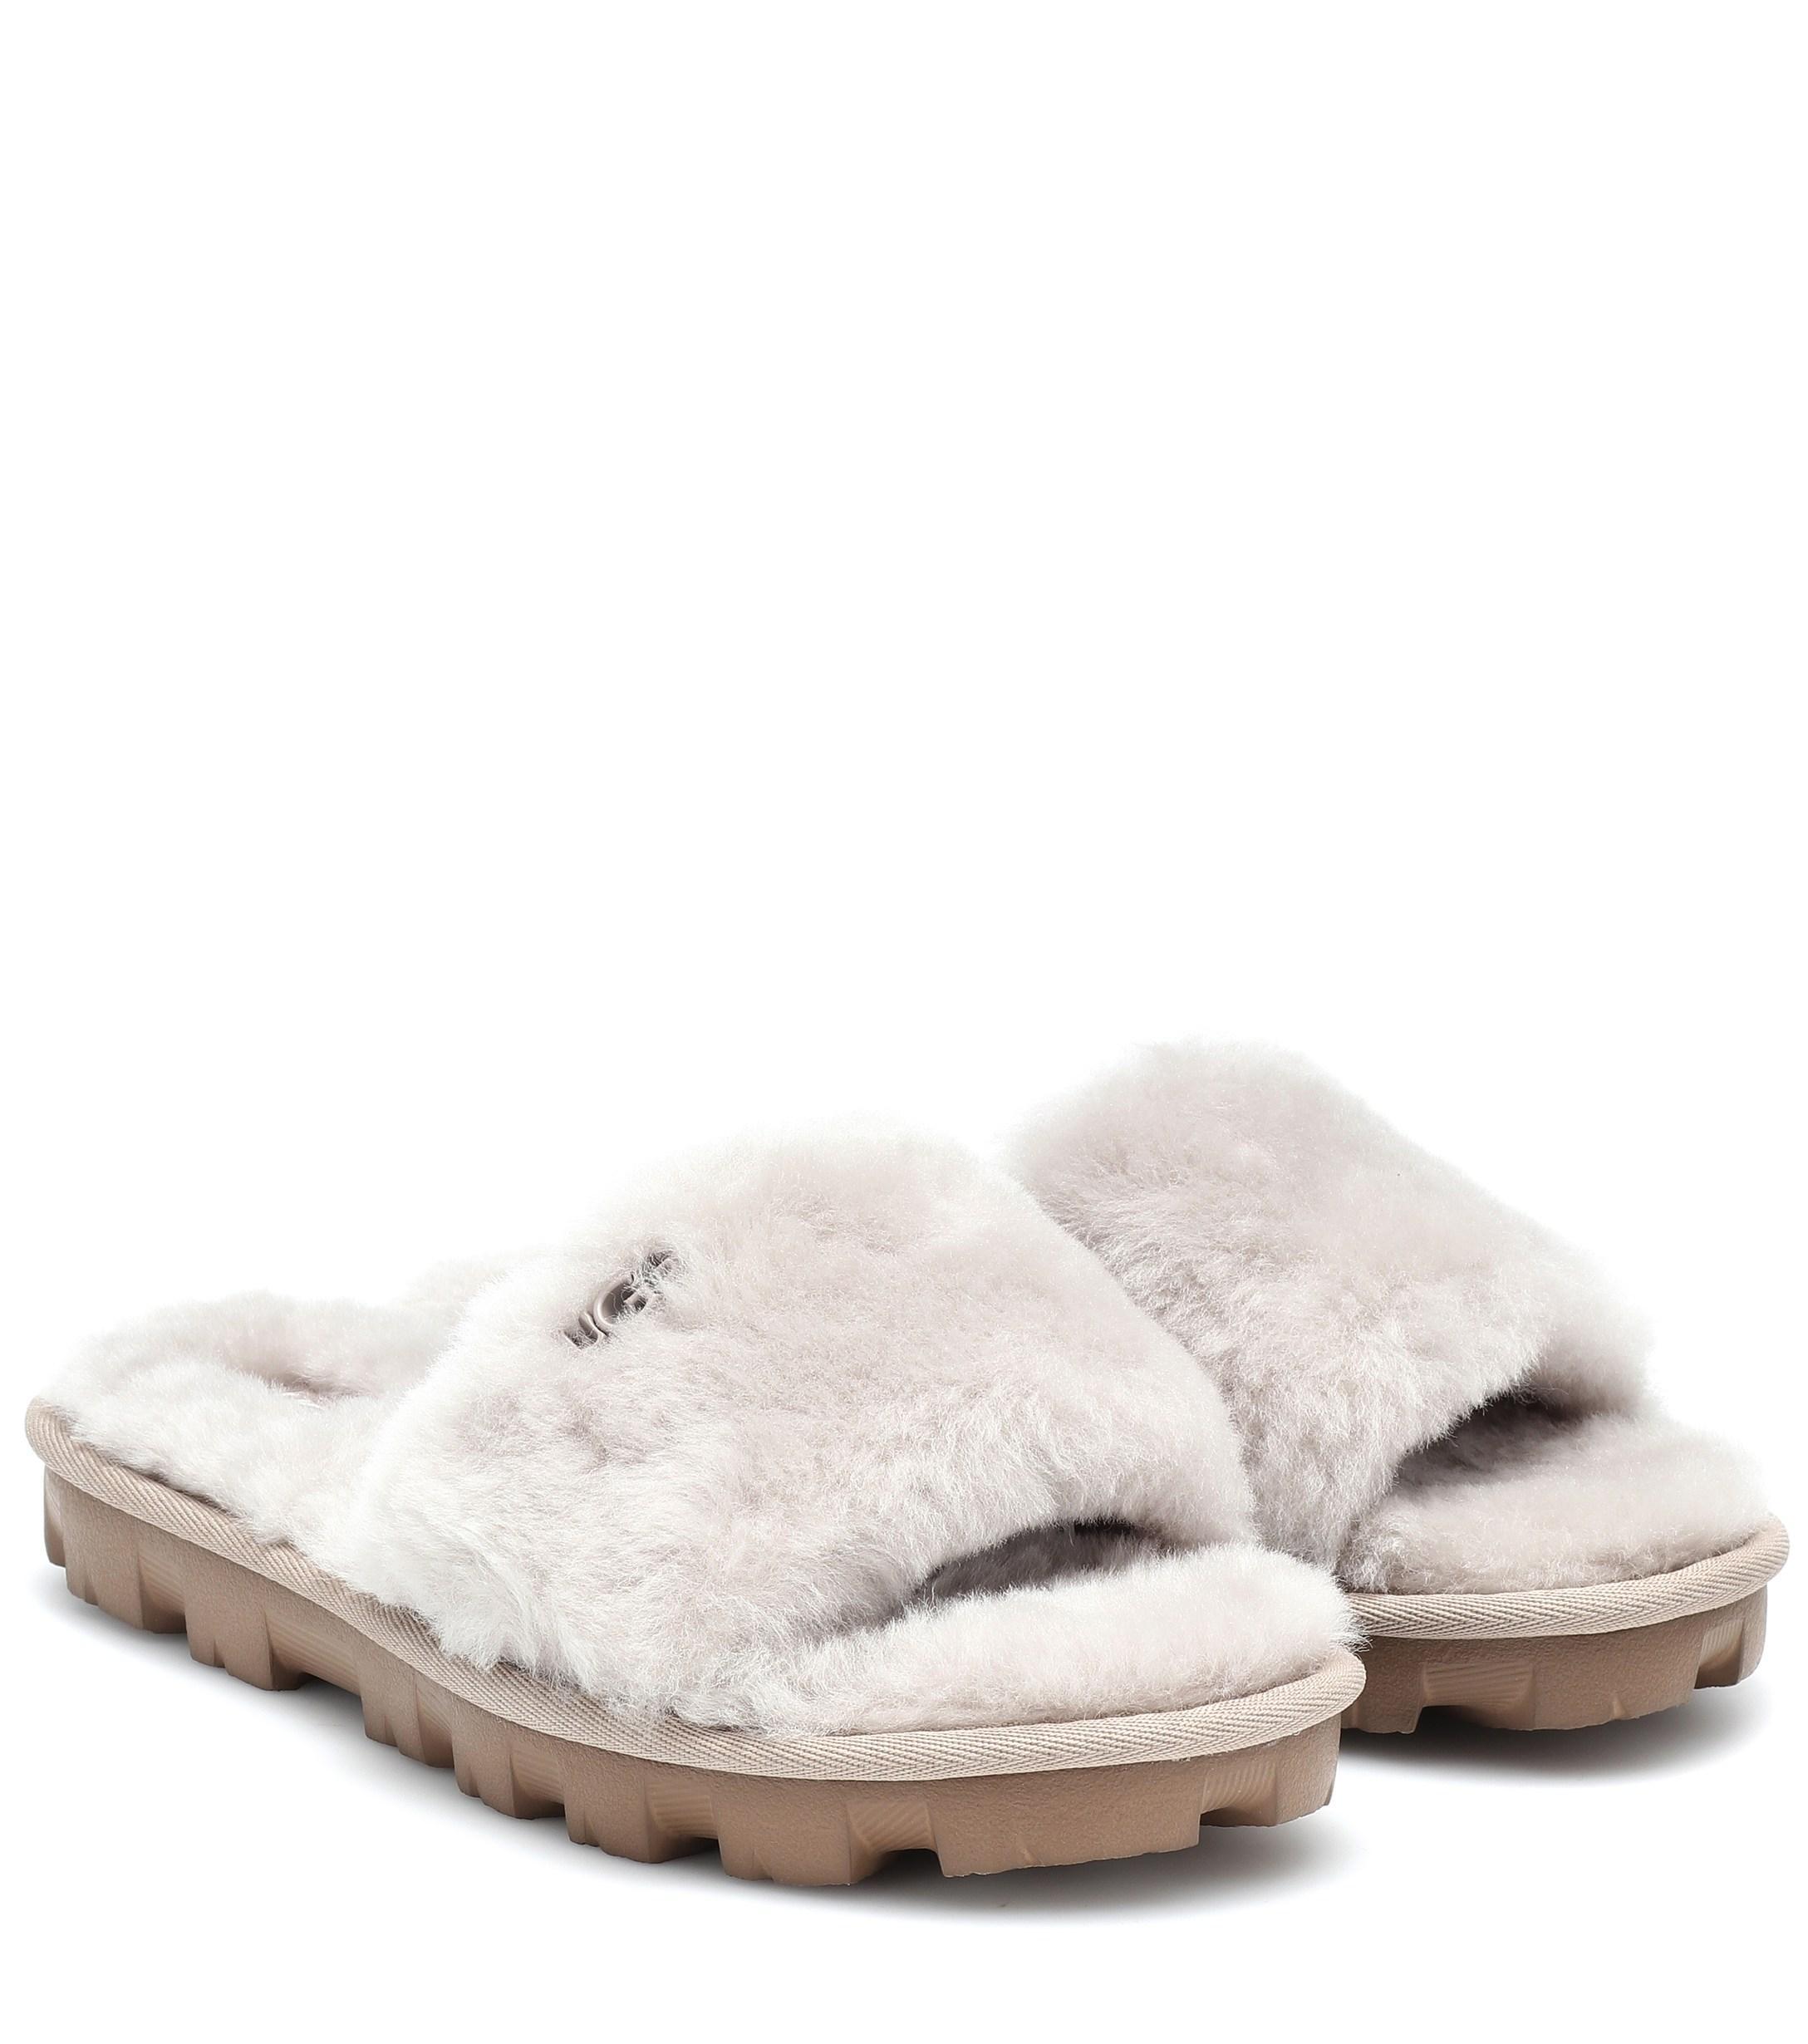 4103f3db504 UGG Cozette Fur Slides in Gray - Lyst